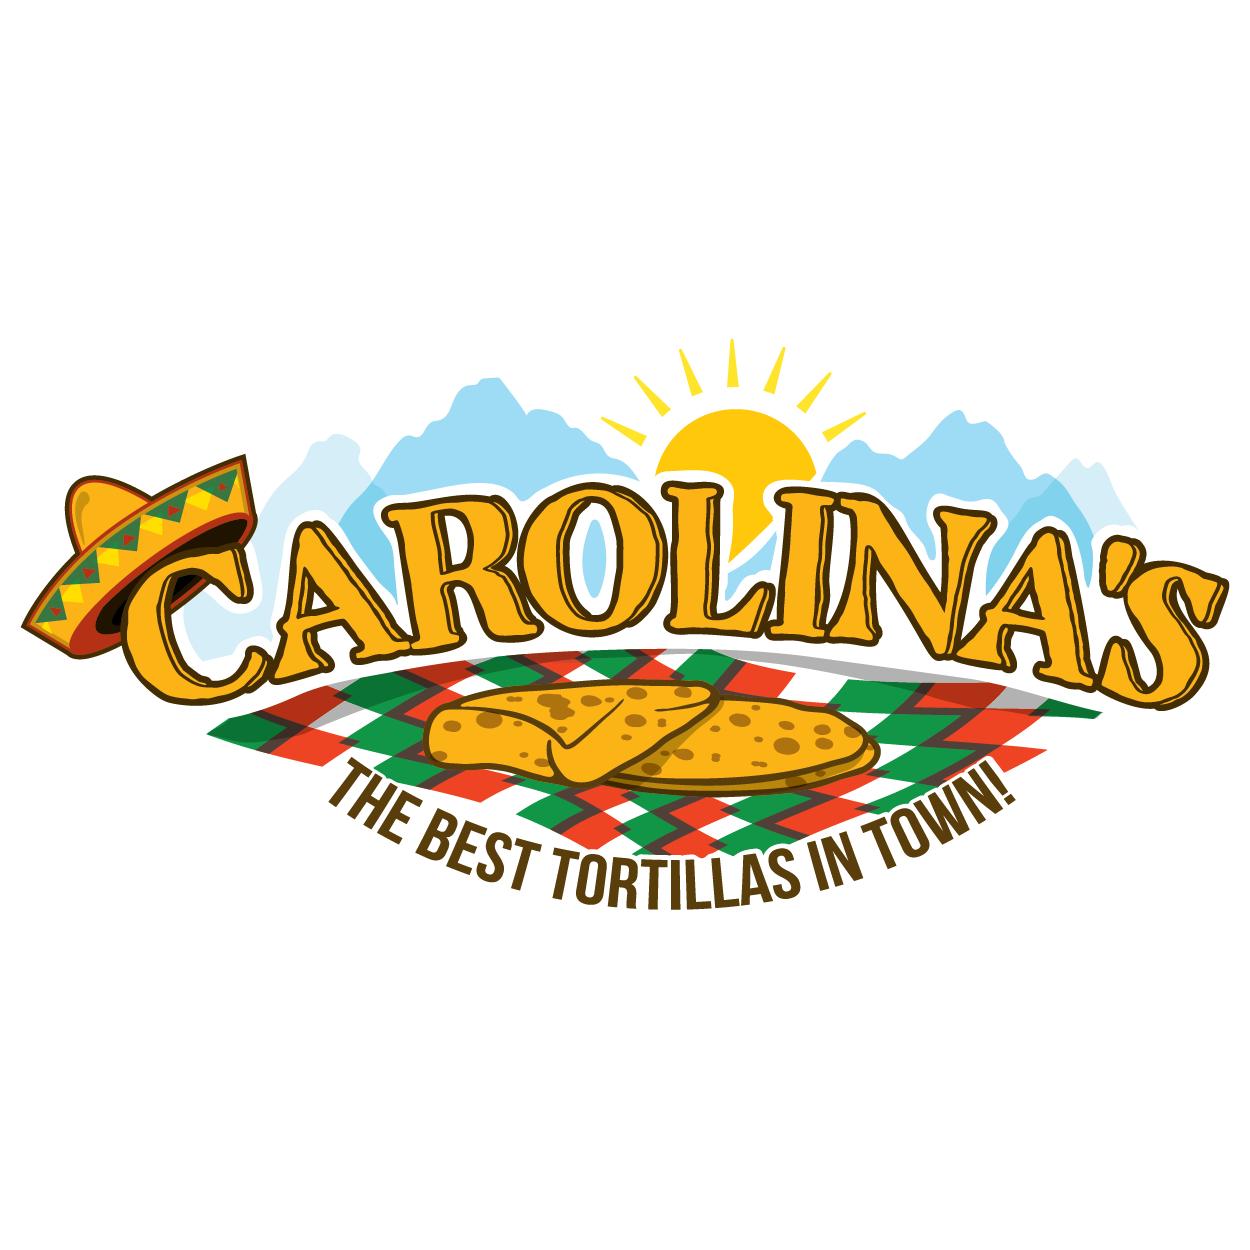 Carolina's Mexican Food North